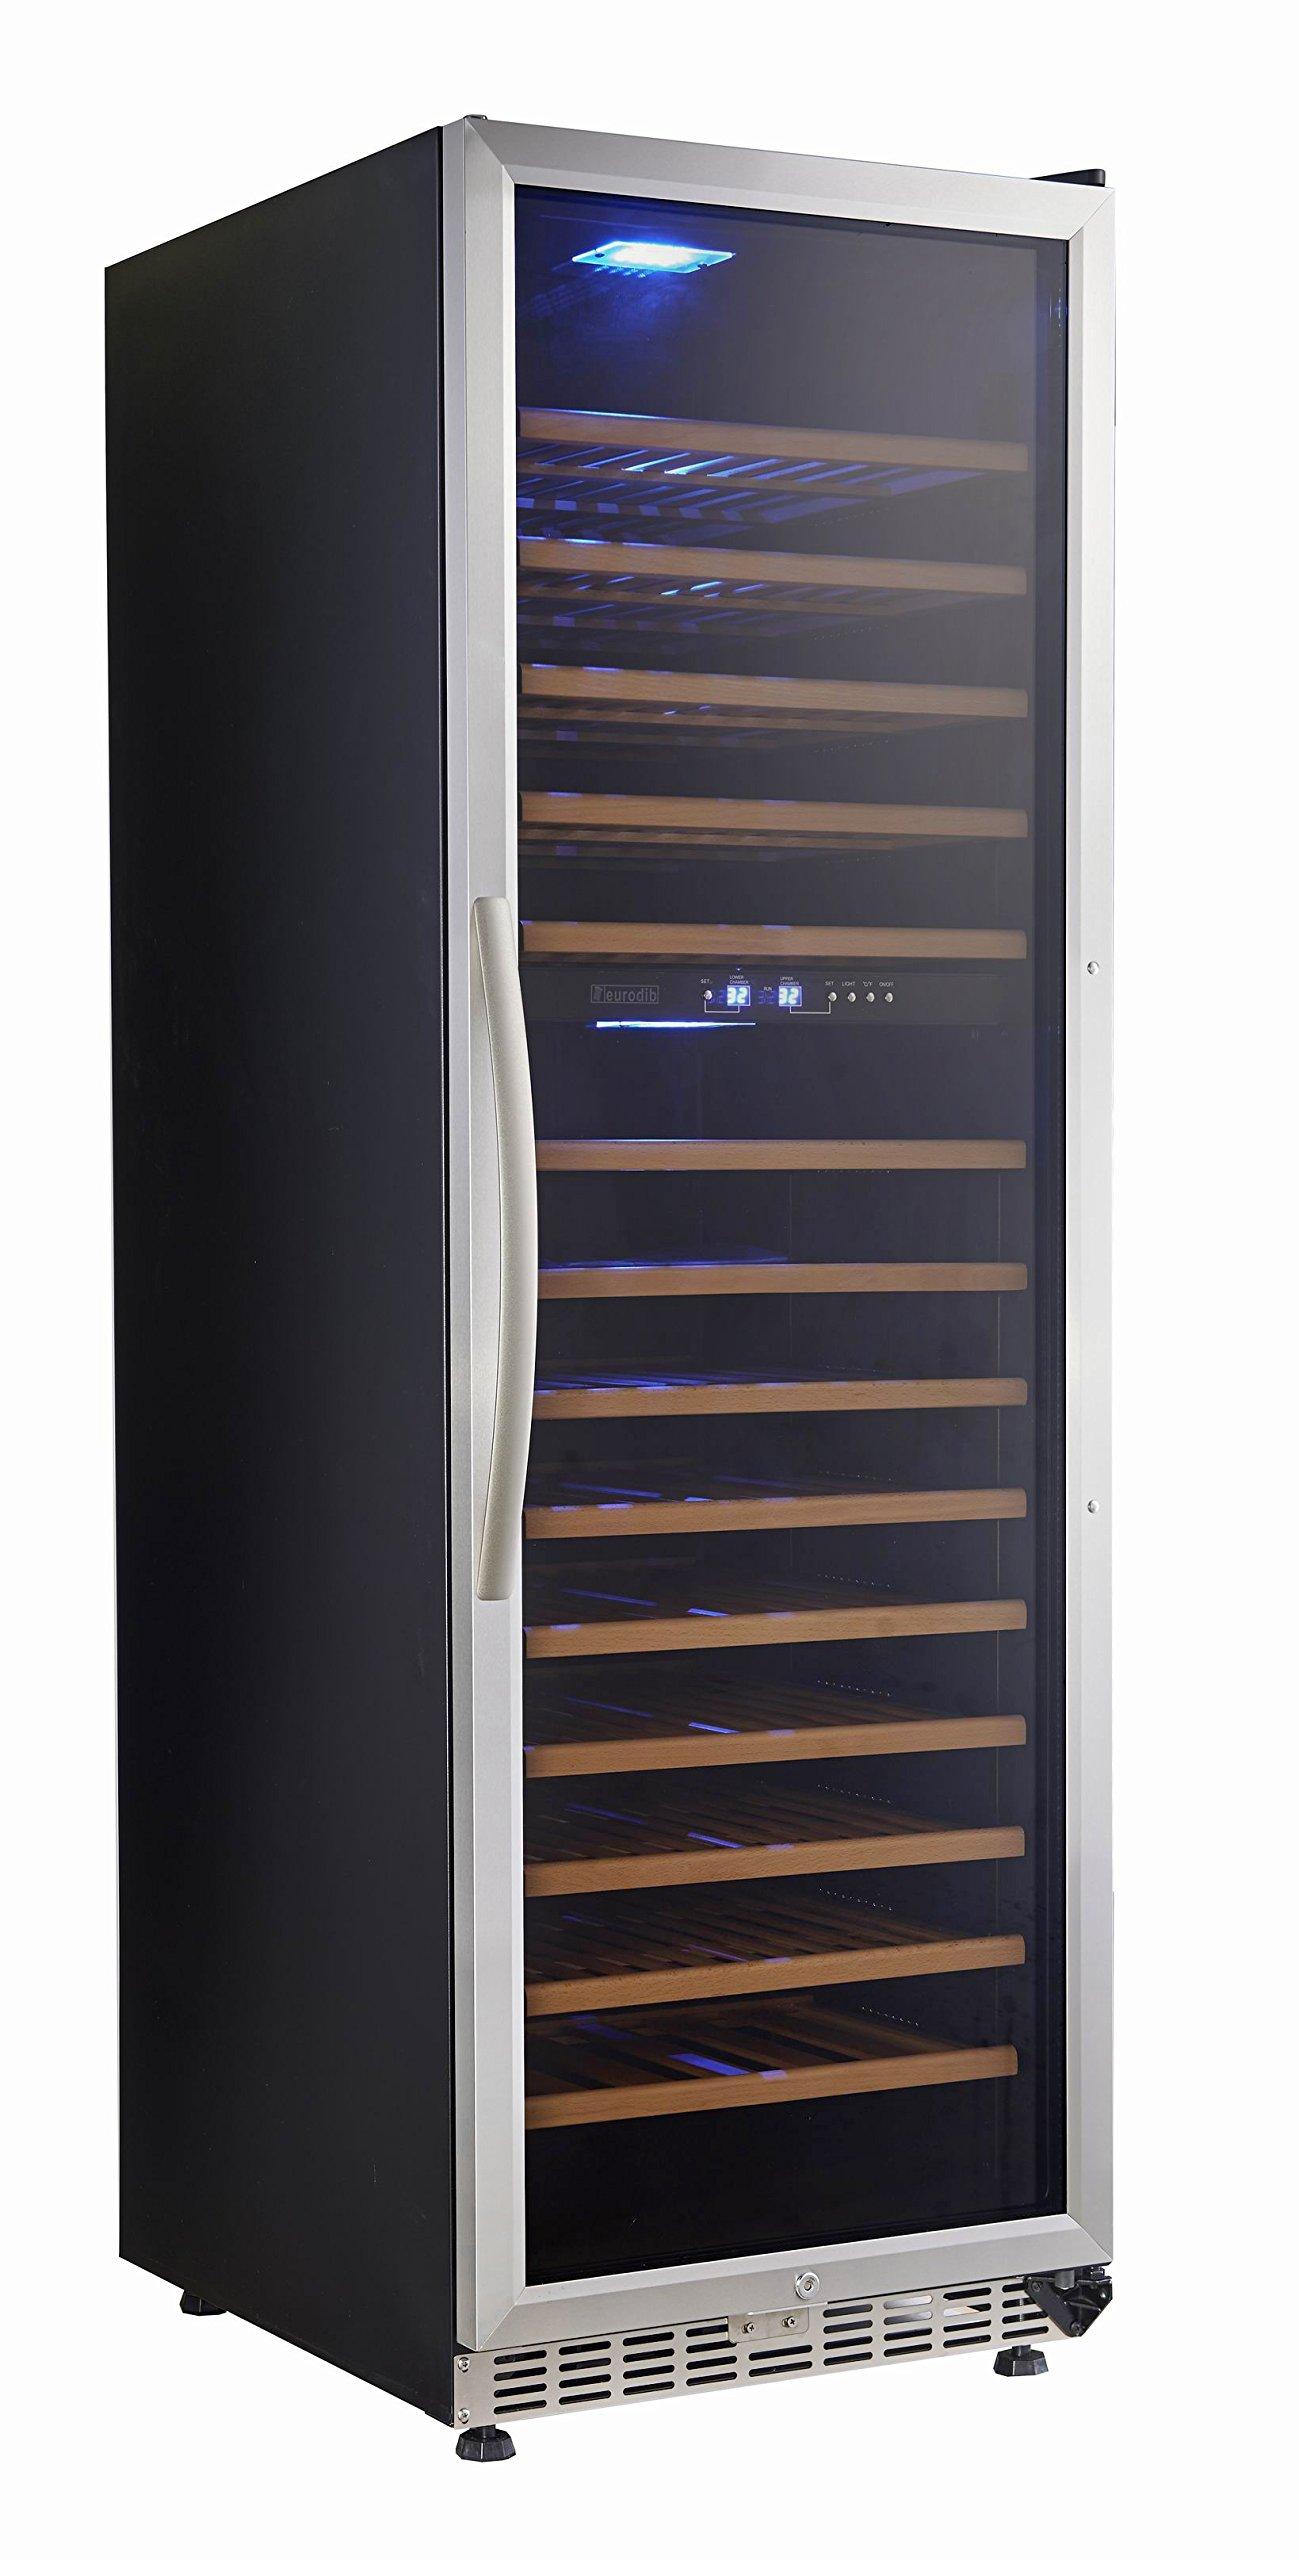 Eurodib USF168D 154 Bottles Dual Temperature Wine Cellar